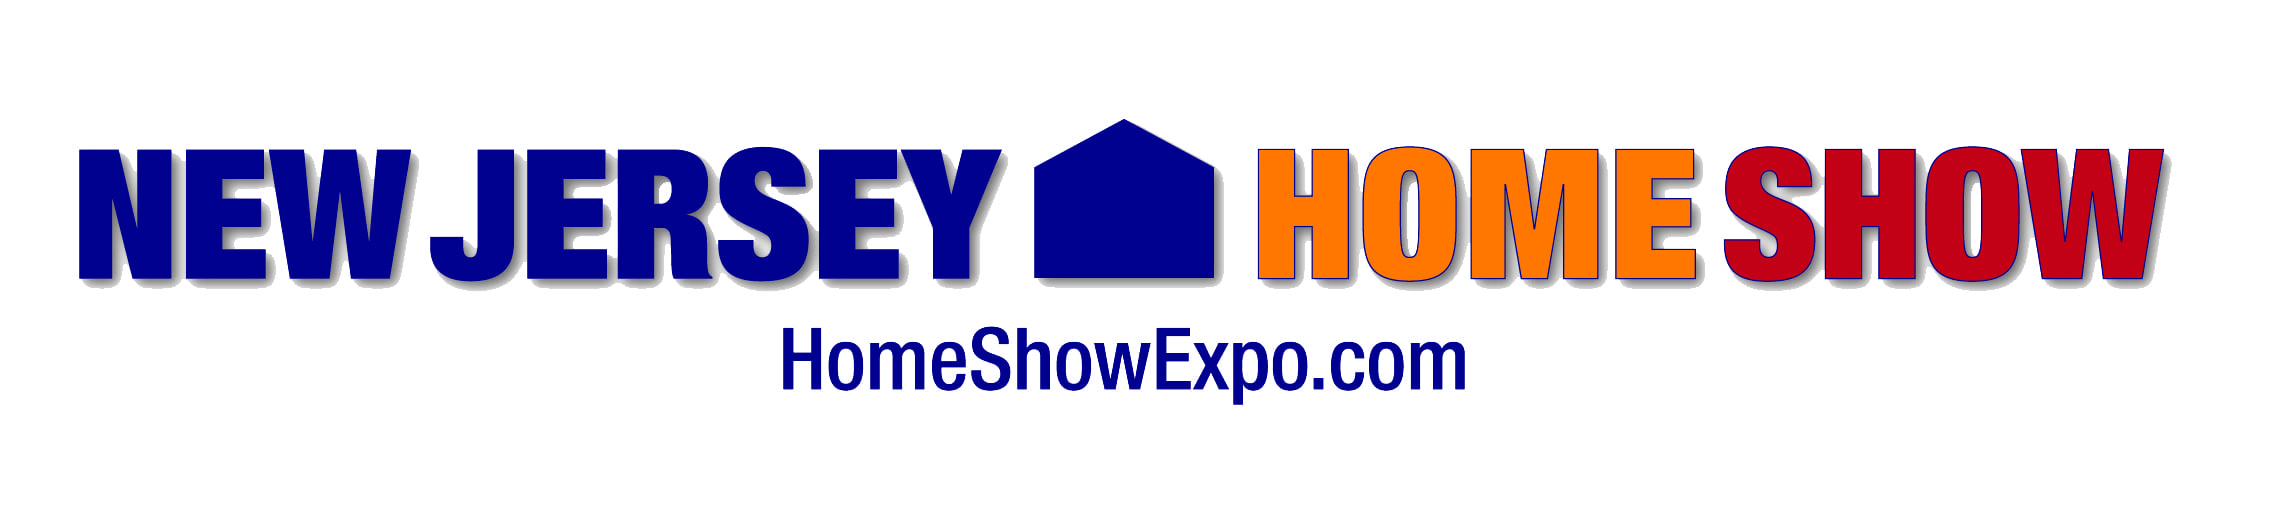 homeshow_logo_horizontal  -TRANS.jpg